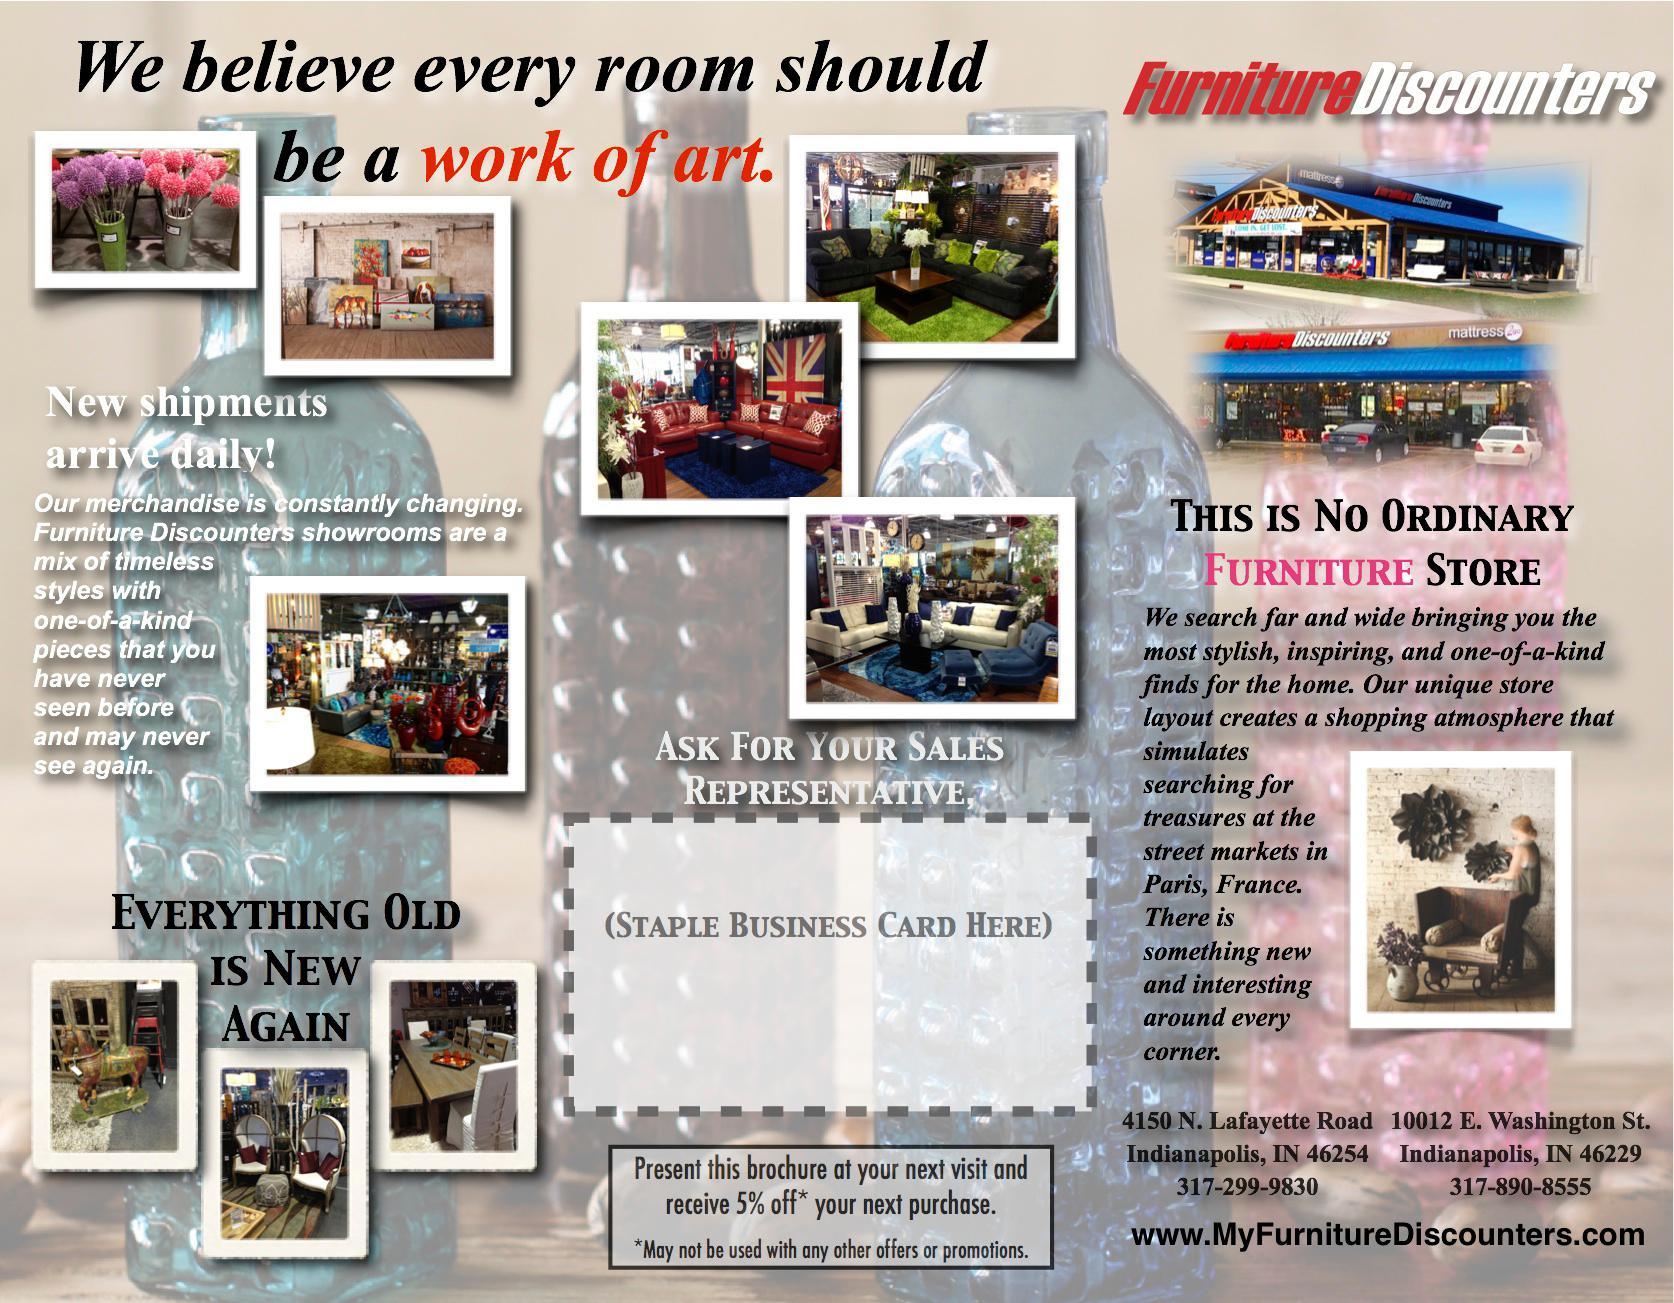 Furniture Discounters (lafayette Rd) image 2